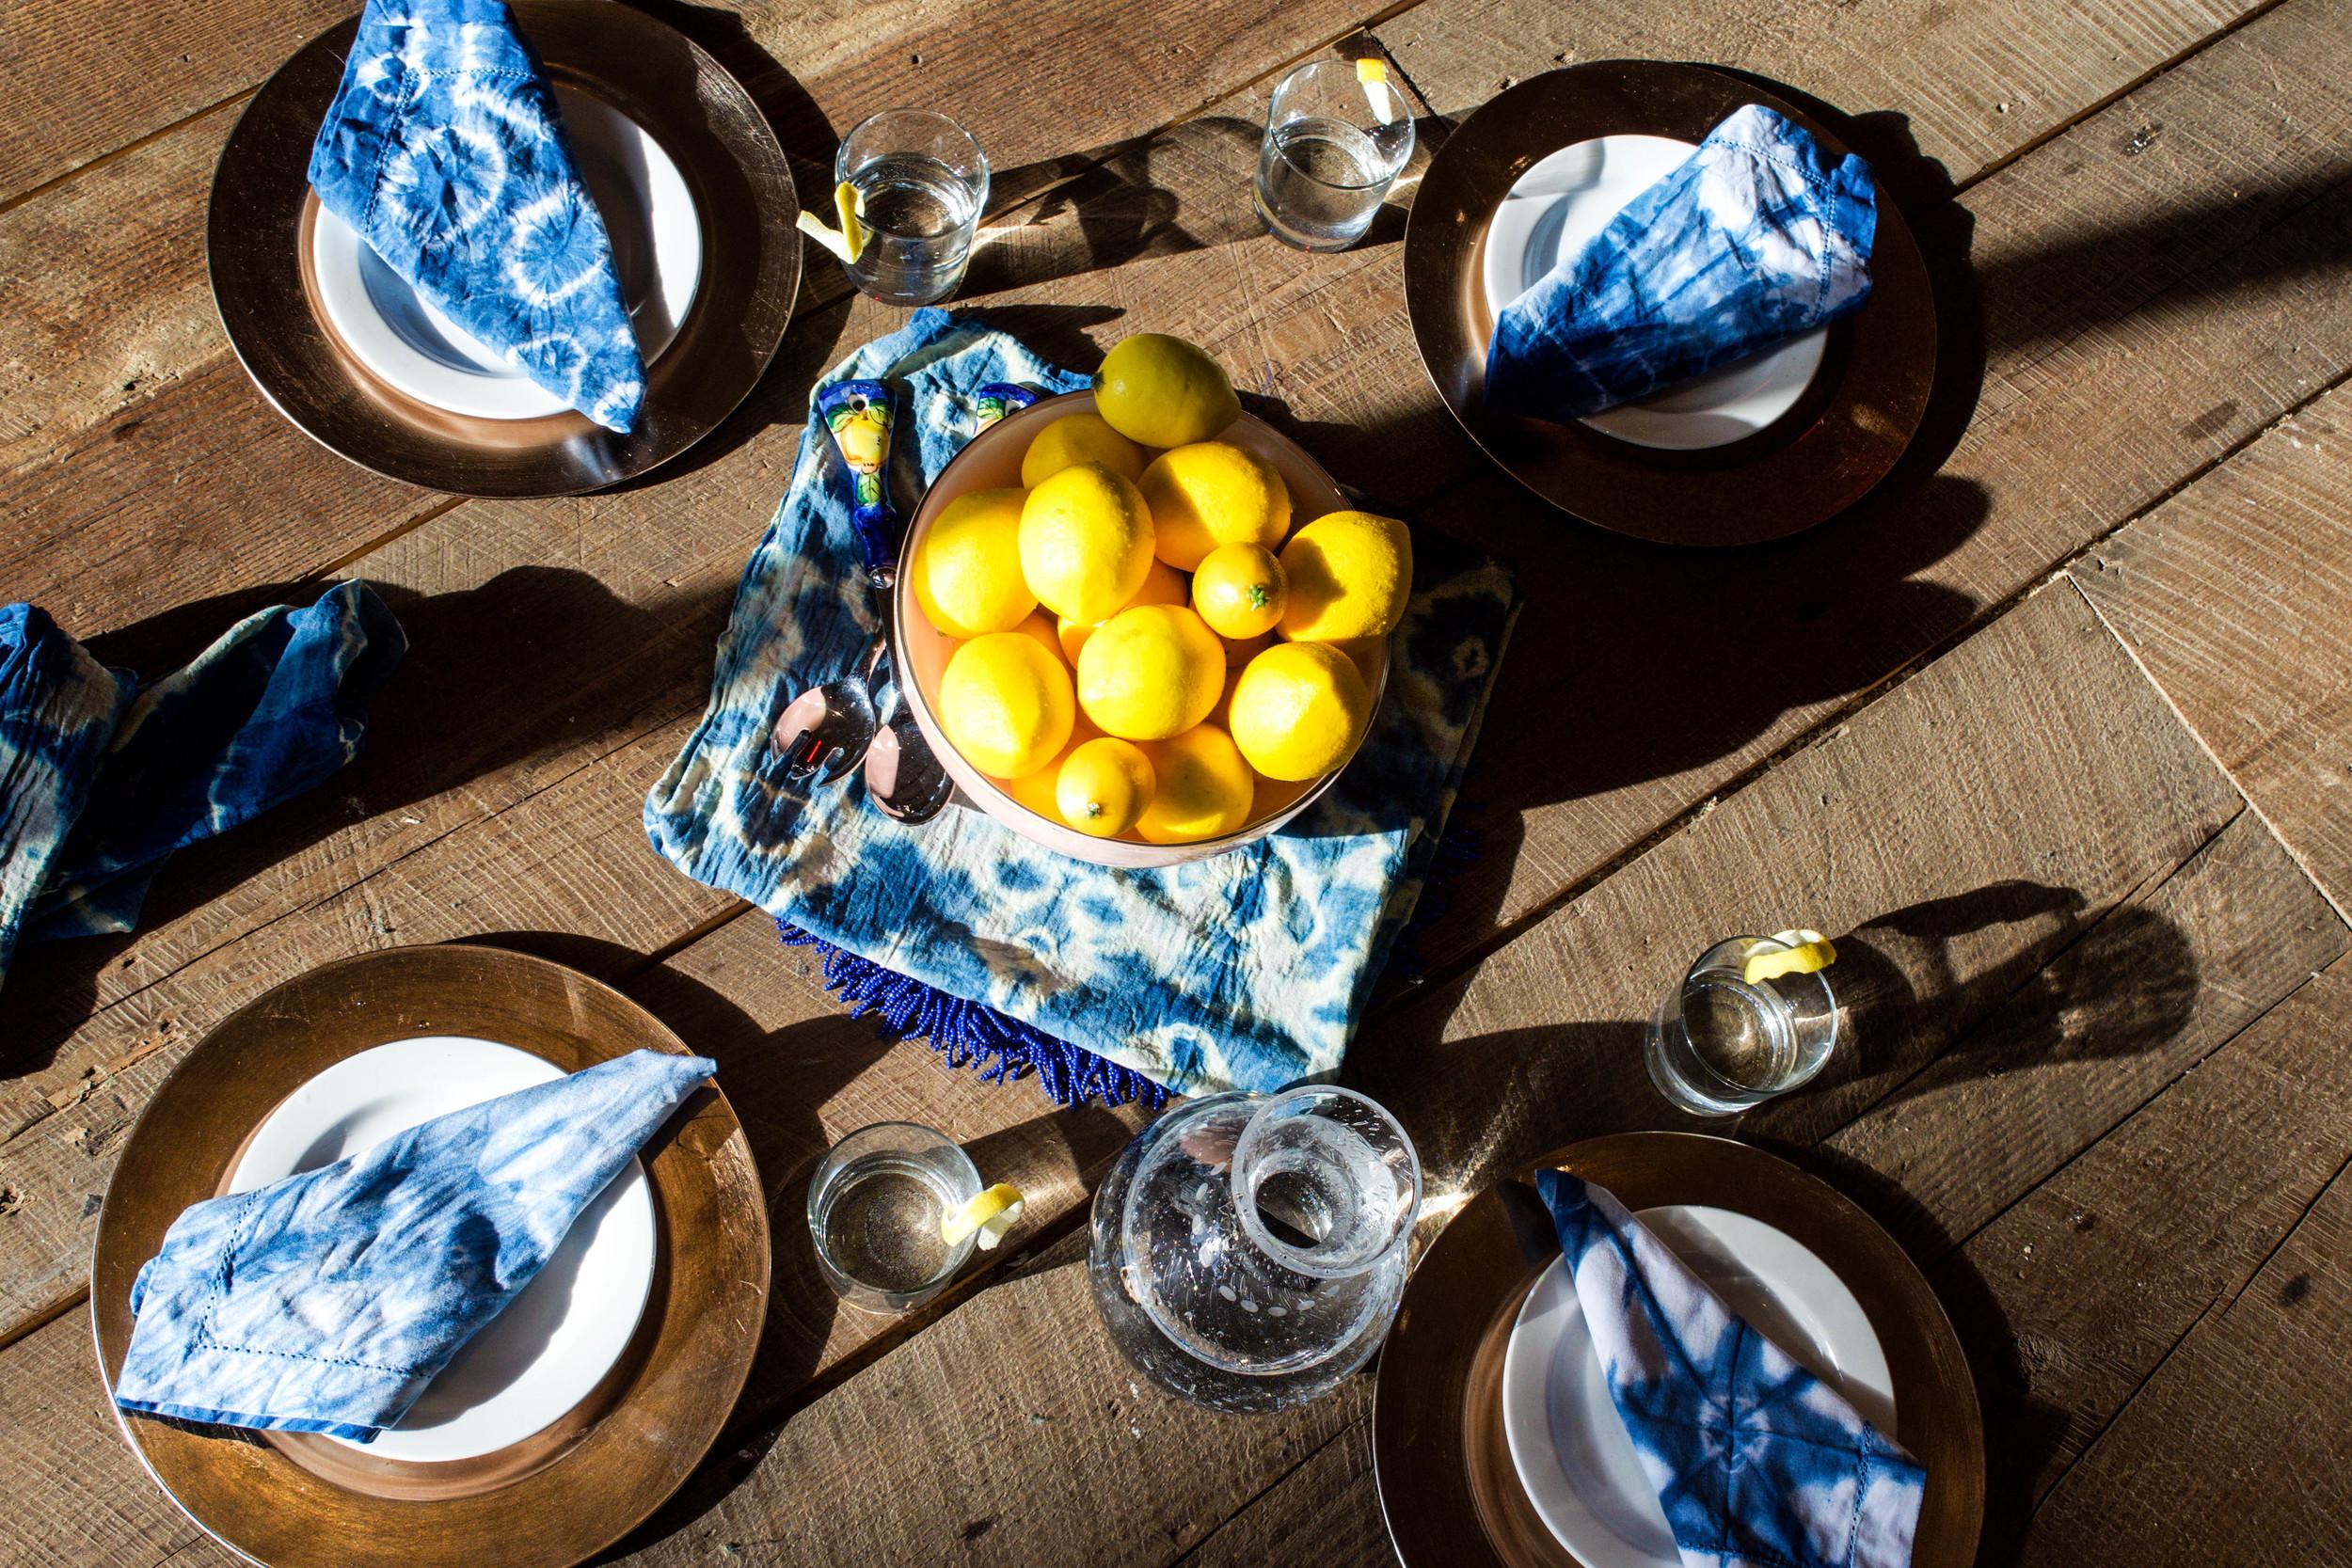 Summer table setting lemons and indigo tie dye napkins